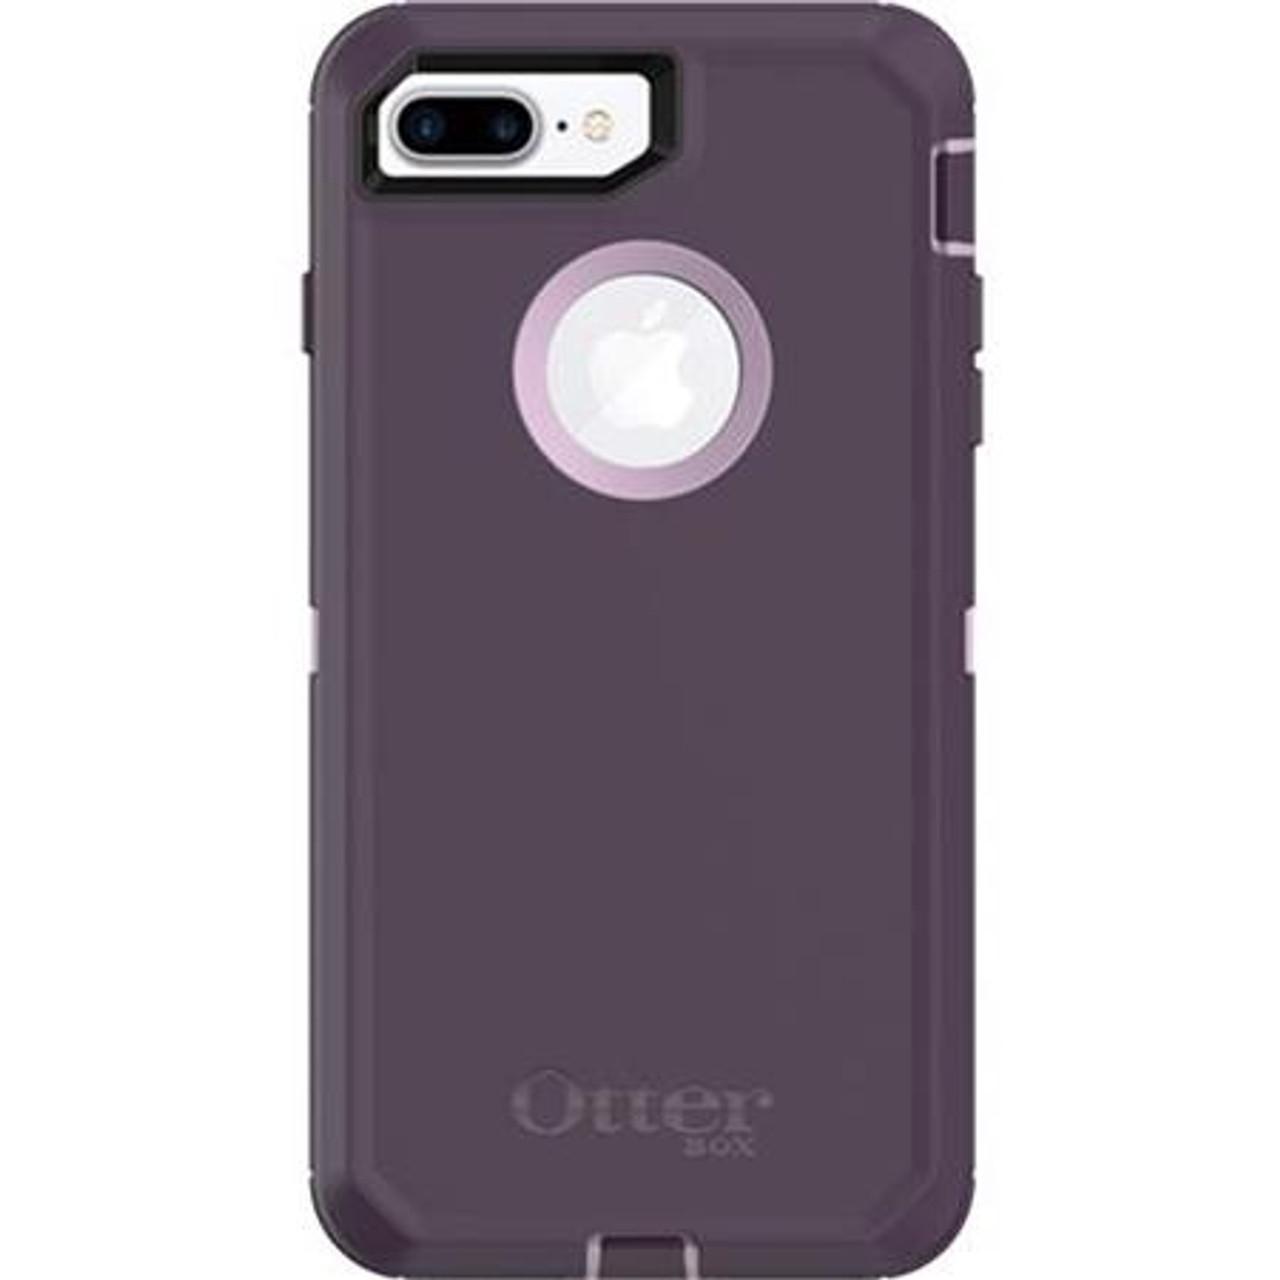 premium selection 4c5cf e4310 OtterBox Defender Case for iPhone 7 Plus/iPhone 8 Plus - Purple Nebula